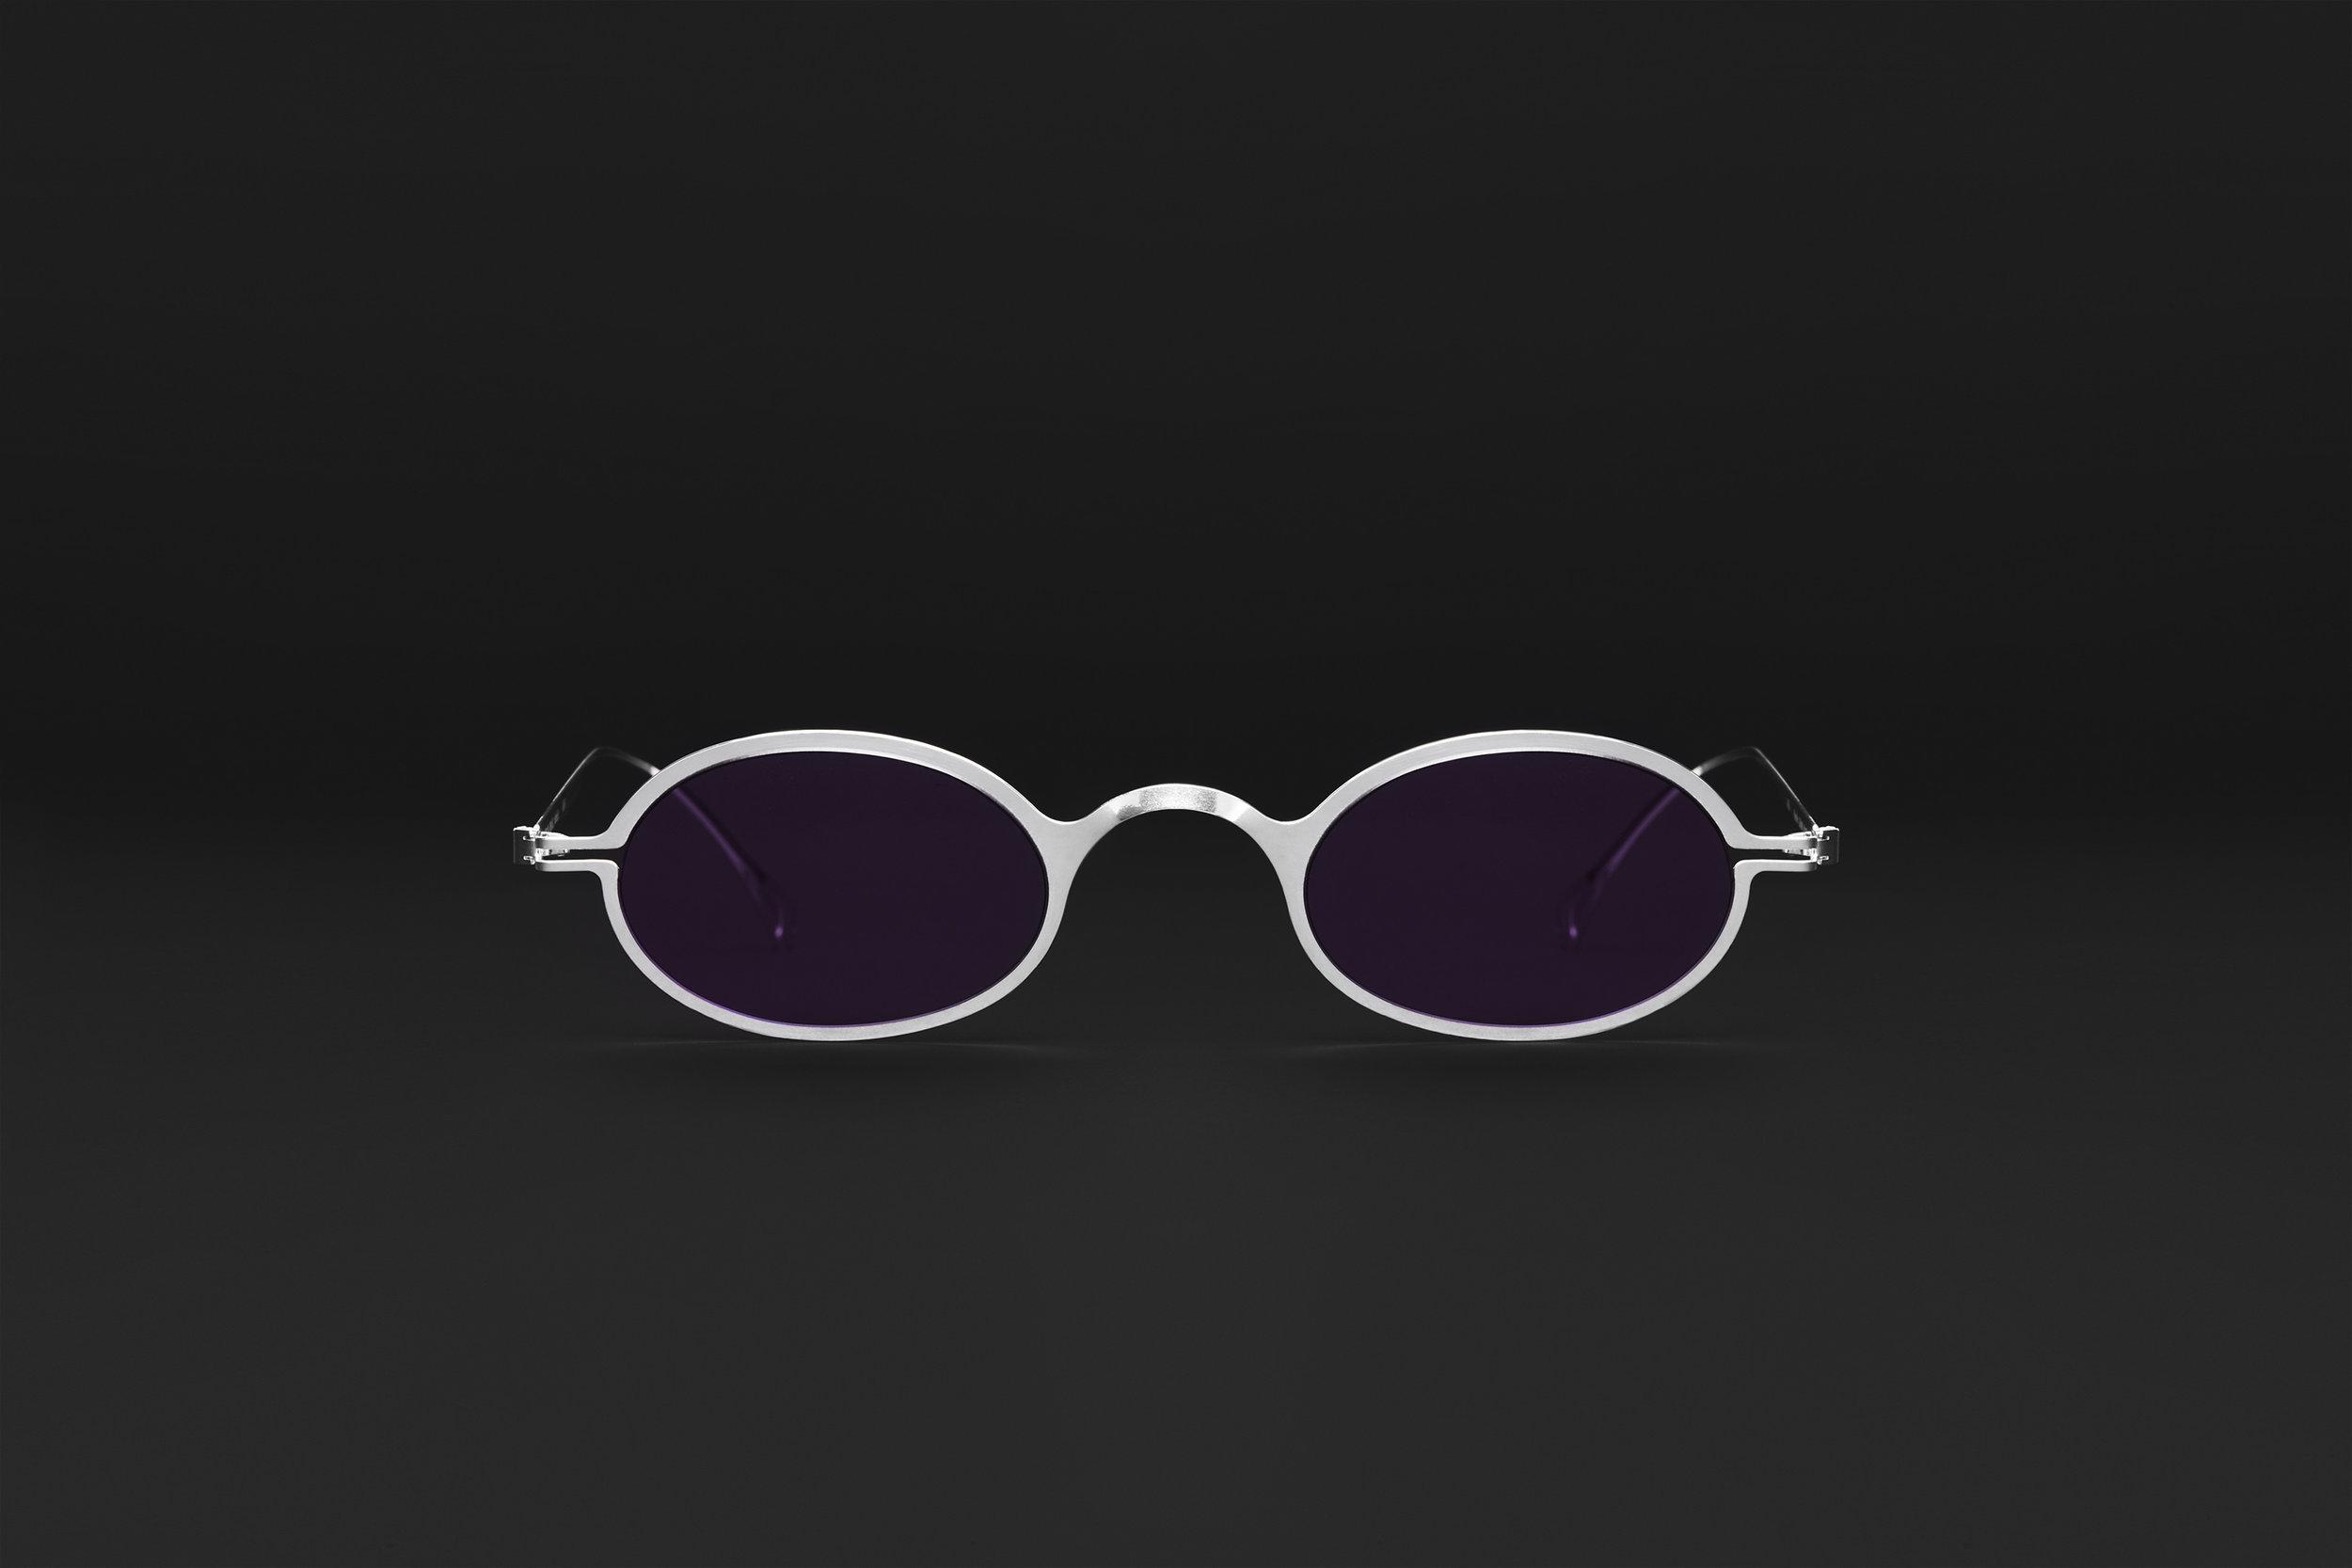 haffmans_neumeister_absinthe_argentum_potassium_violet_phasmid_sunglasses_front_102220.jpg